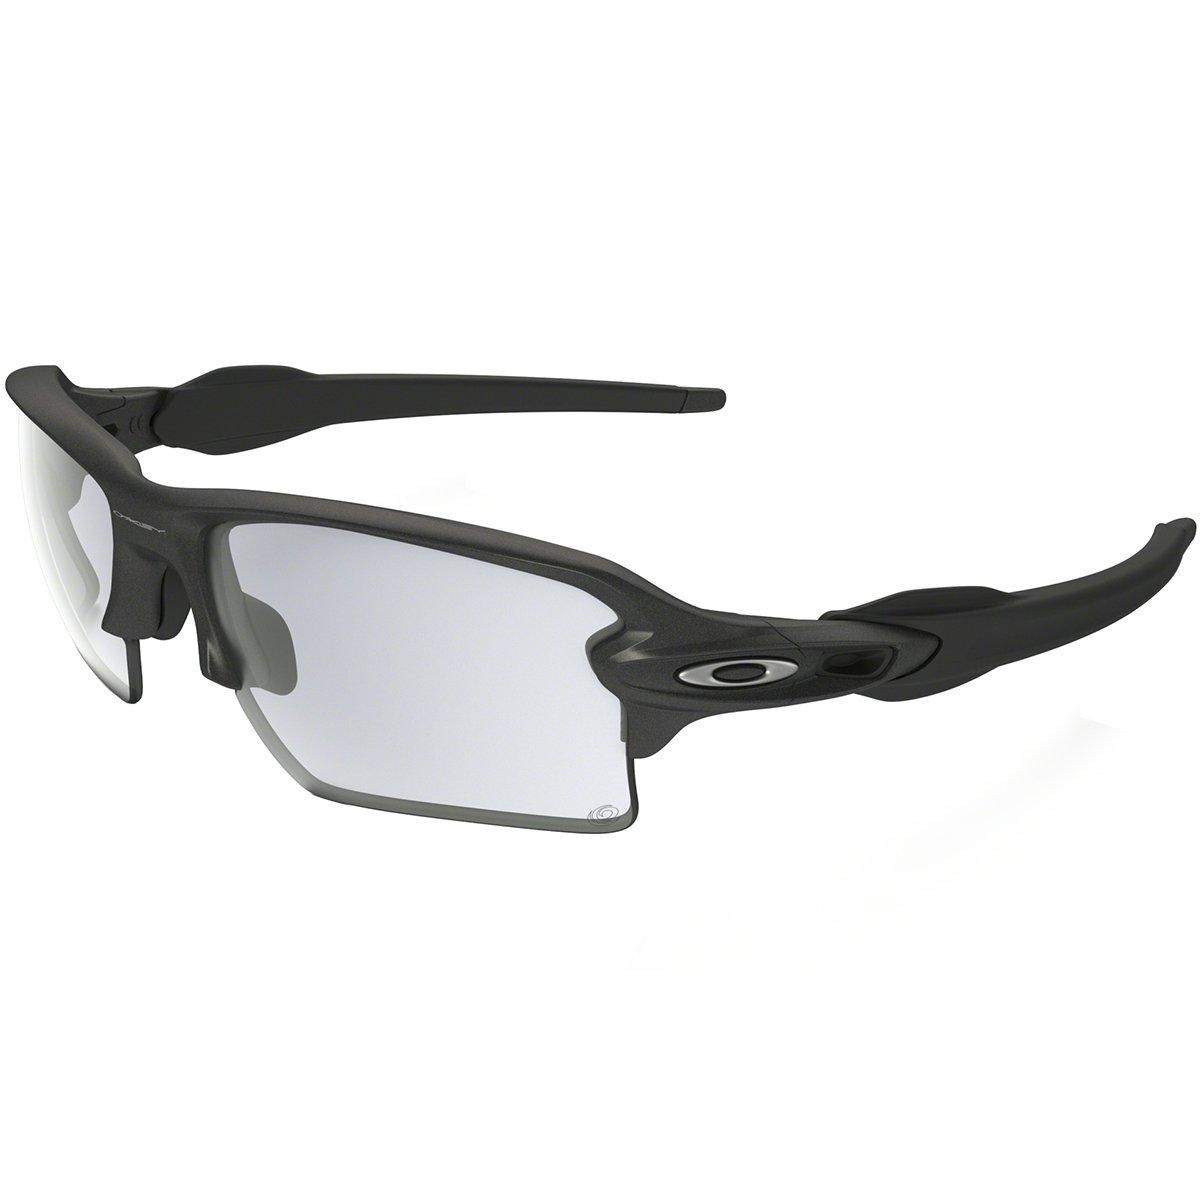 fd1a27474d Galleon - Oakley Men s Flak 2.0 XL Non-Polarized Iridium Rectangular  Sunglasses